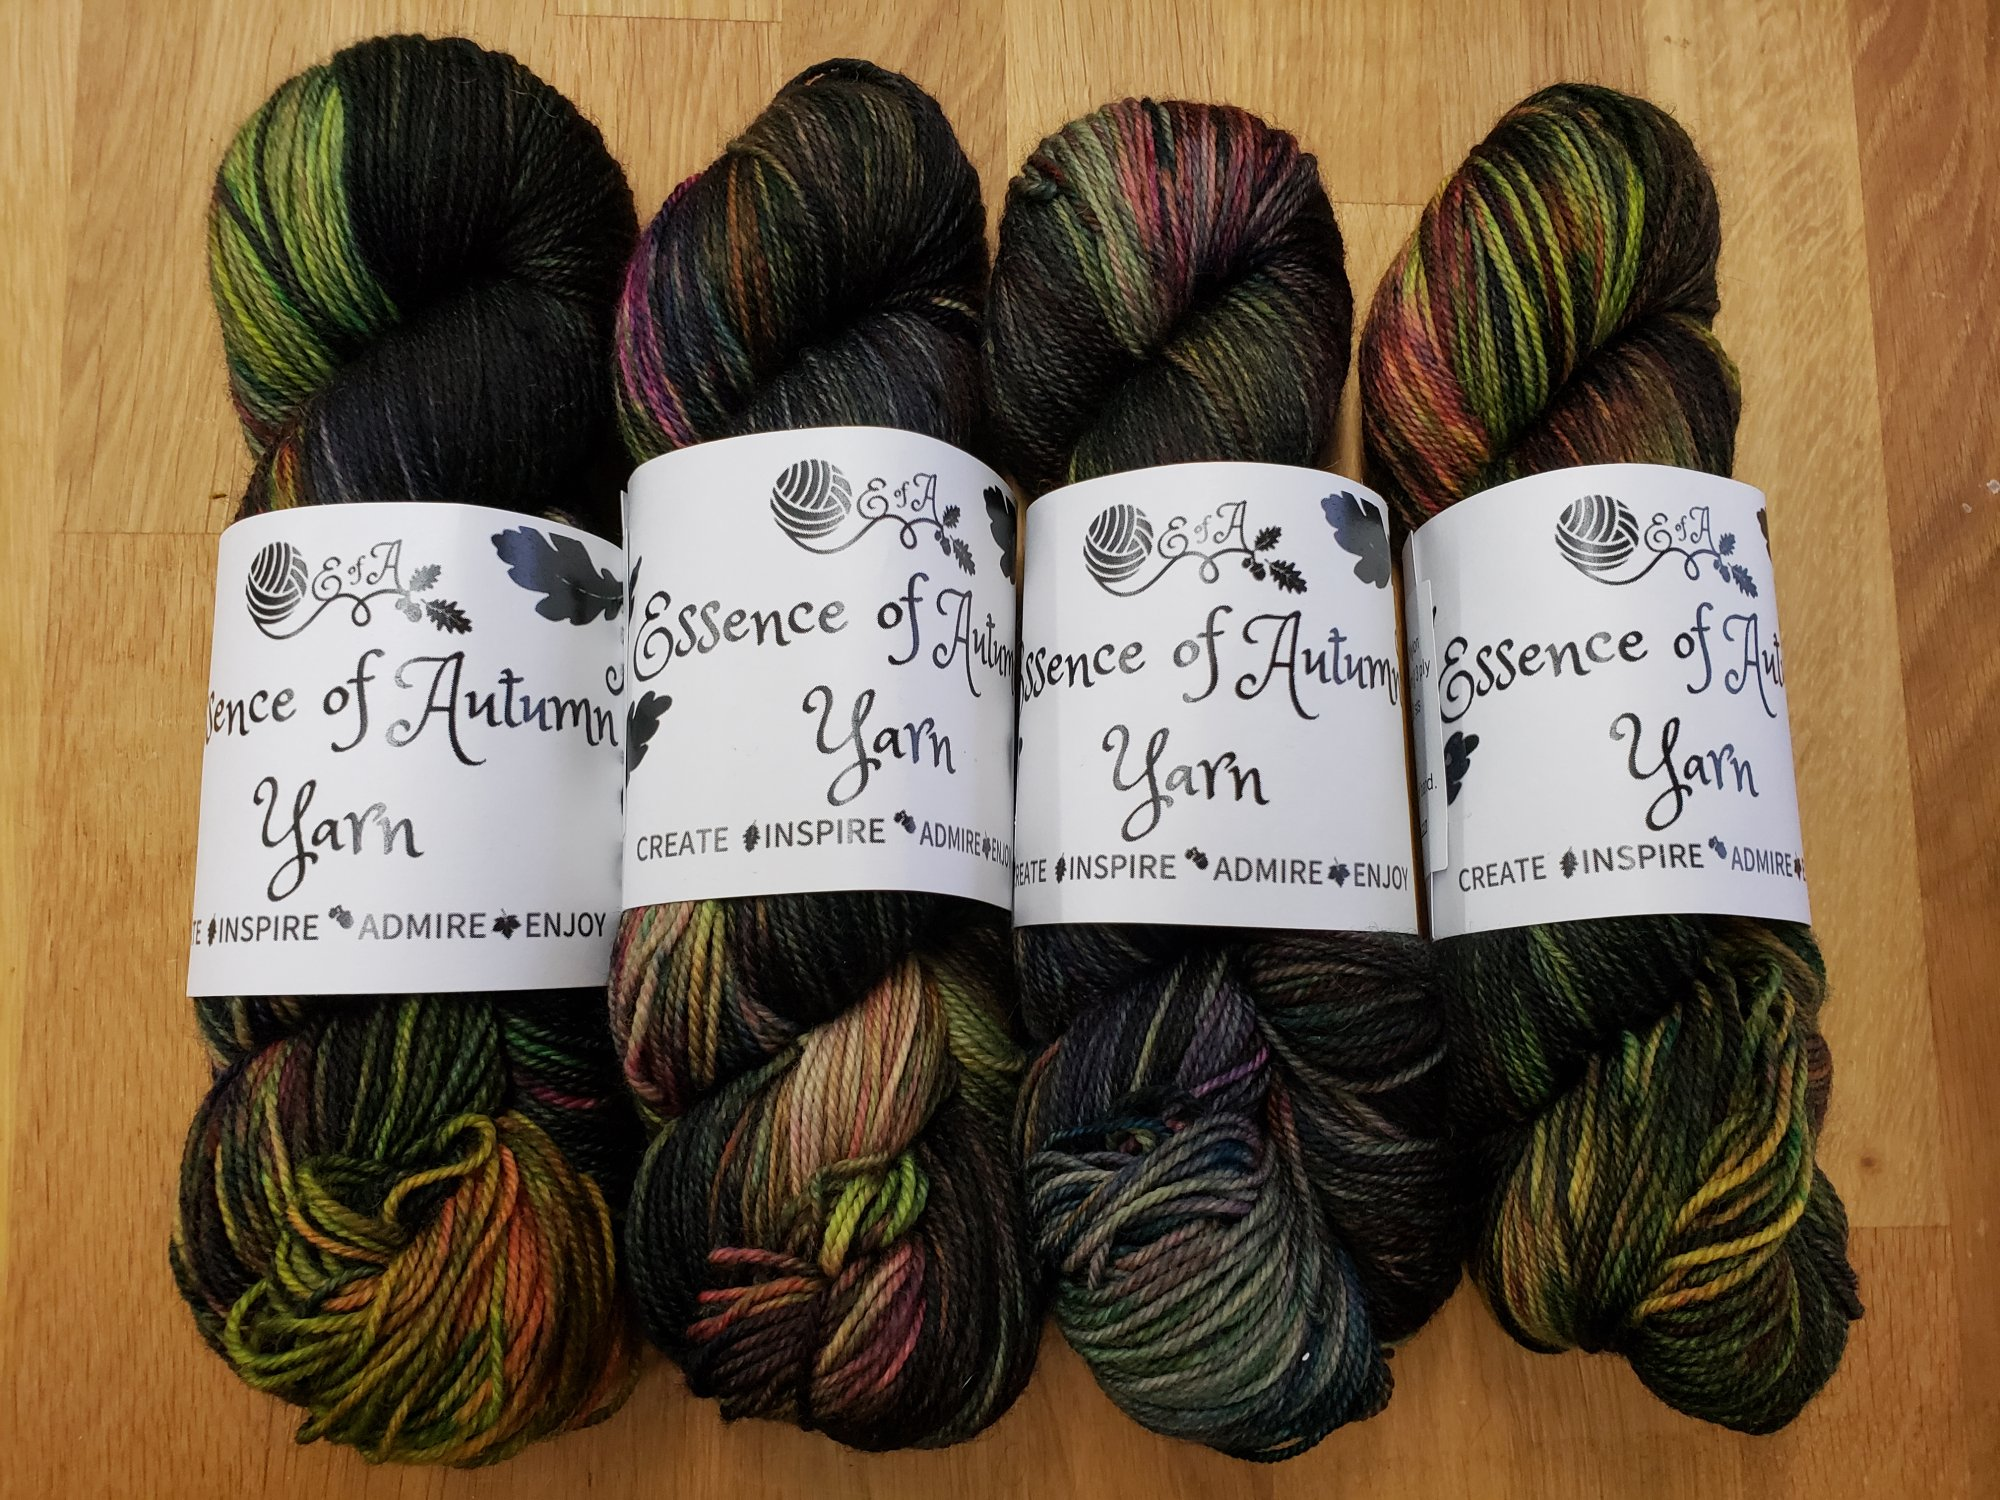 Prairie Sock by Essence of Autumn - 80% SW Merino/20% Nylon